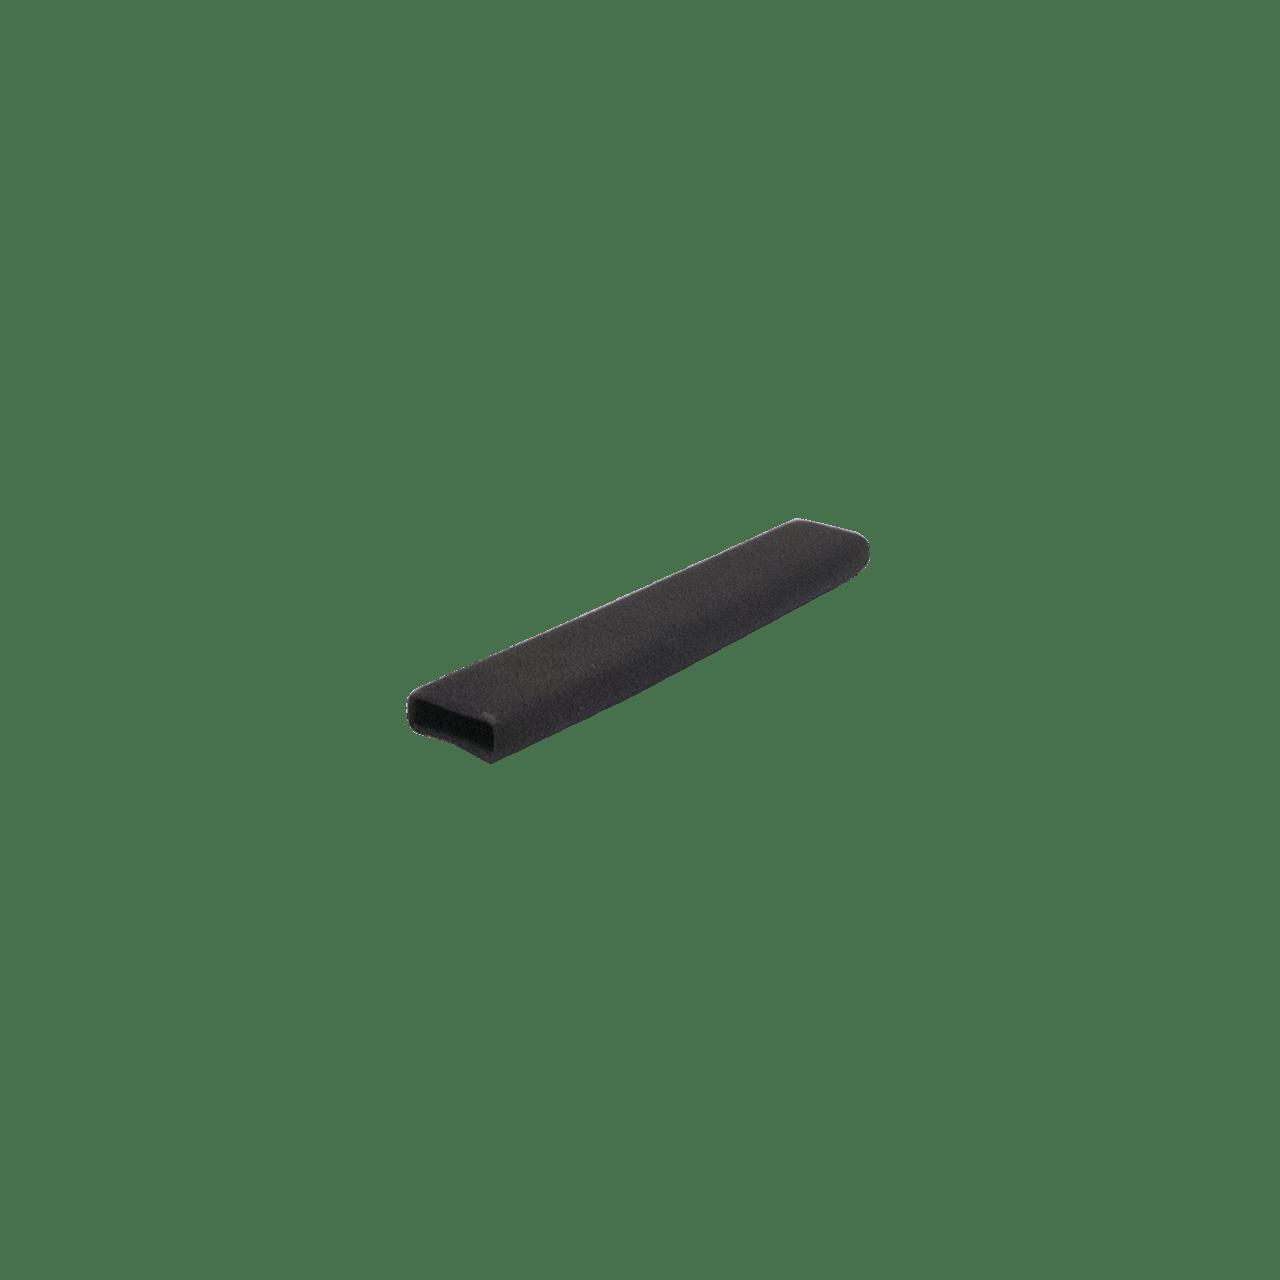 02243X --- Croft Tow Dolly Black Lift Handle Grip